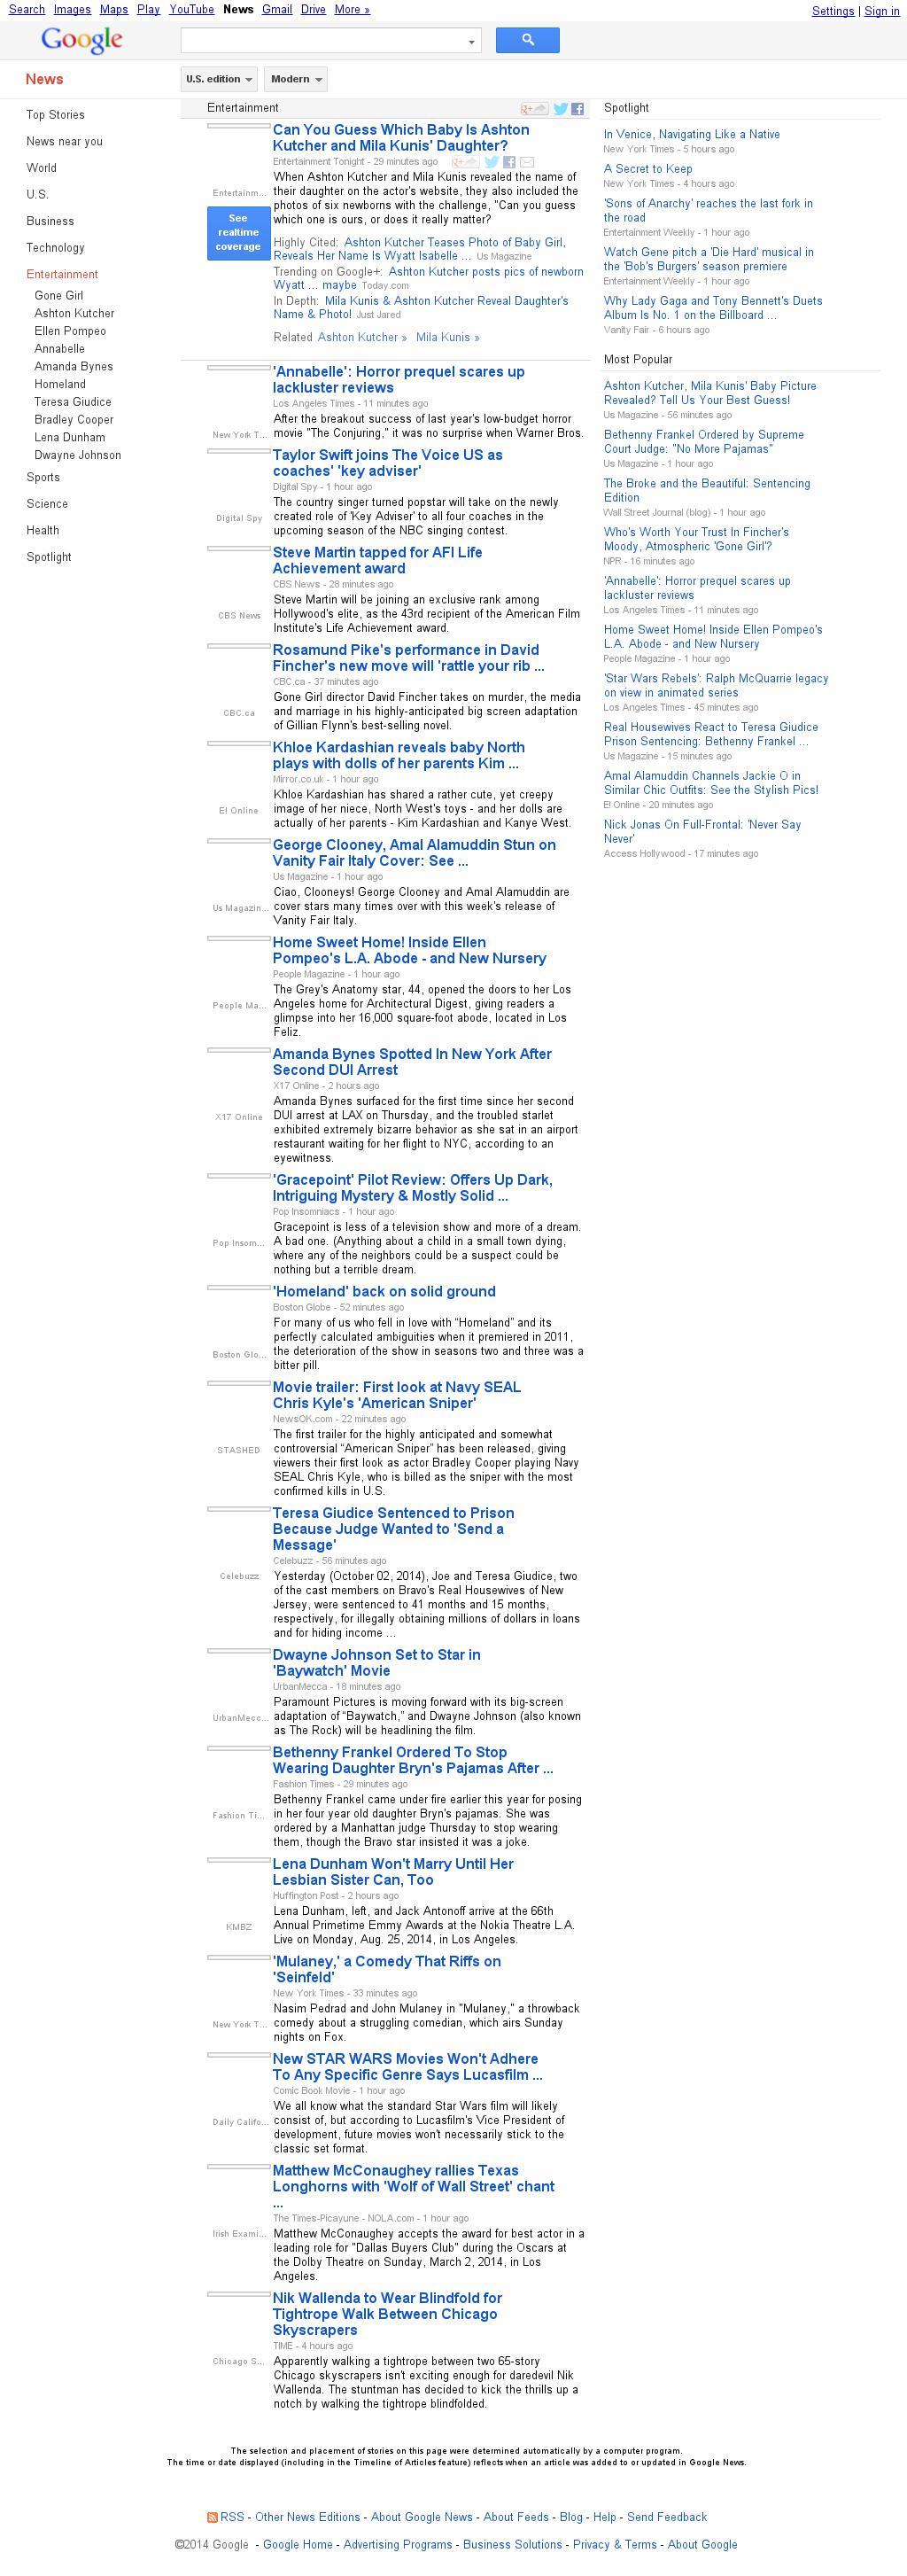 Google News: Entertainment at Friday Oct. 3, 2014, 8:07 p.m. UTC